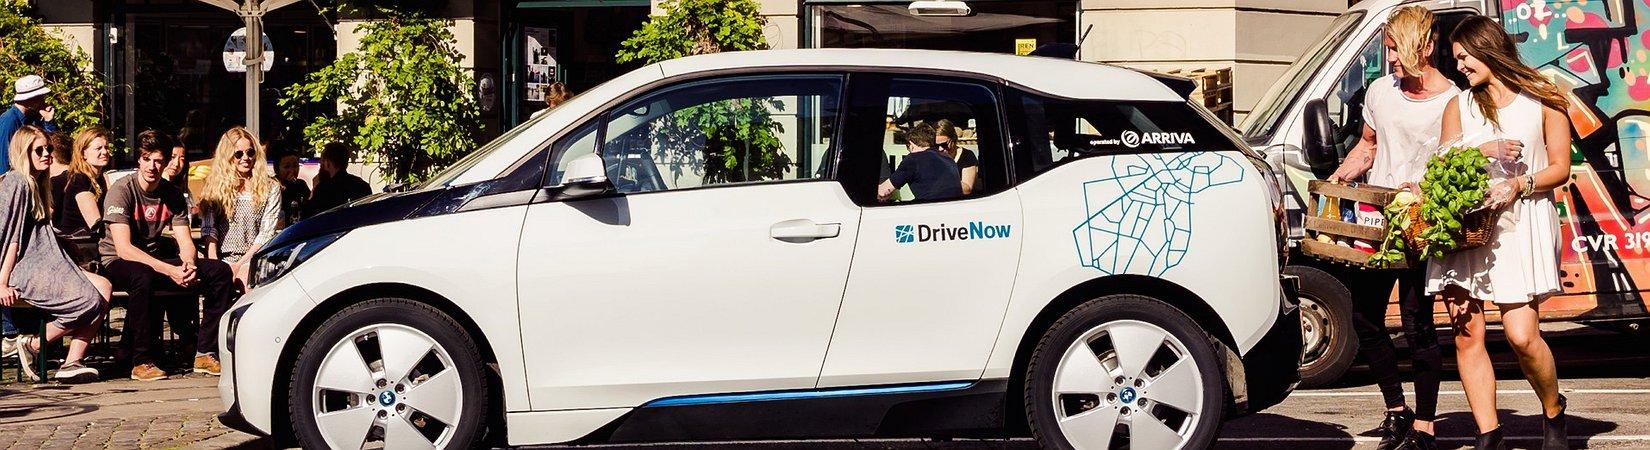 BWM als Uber-Konkurrent